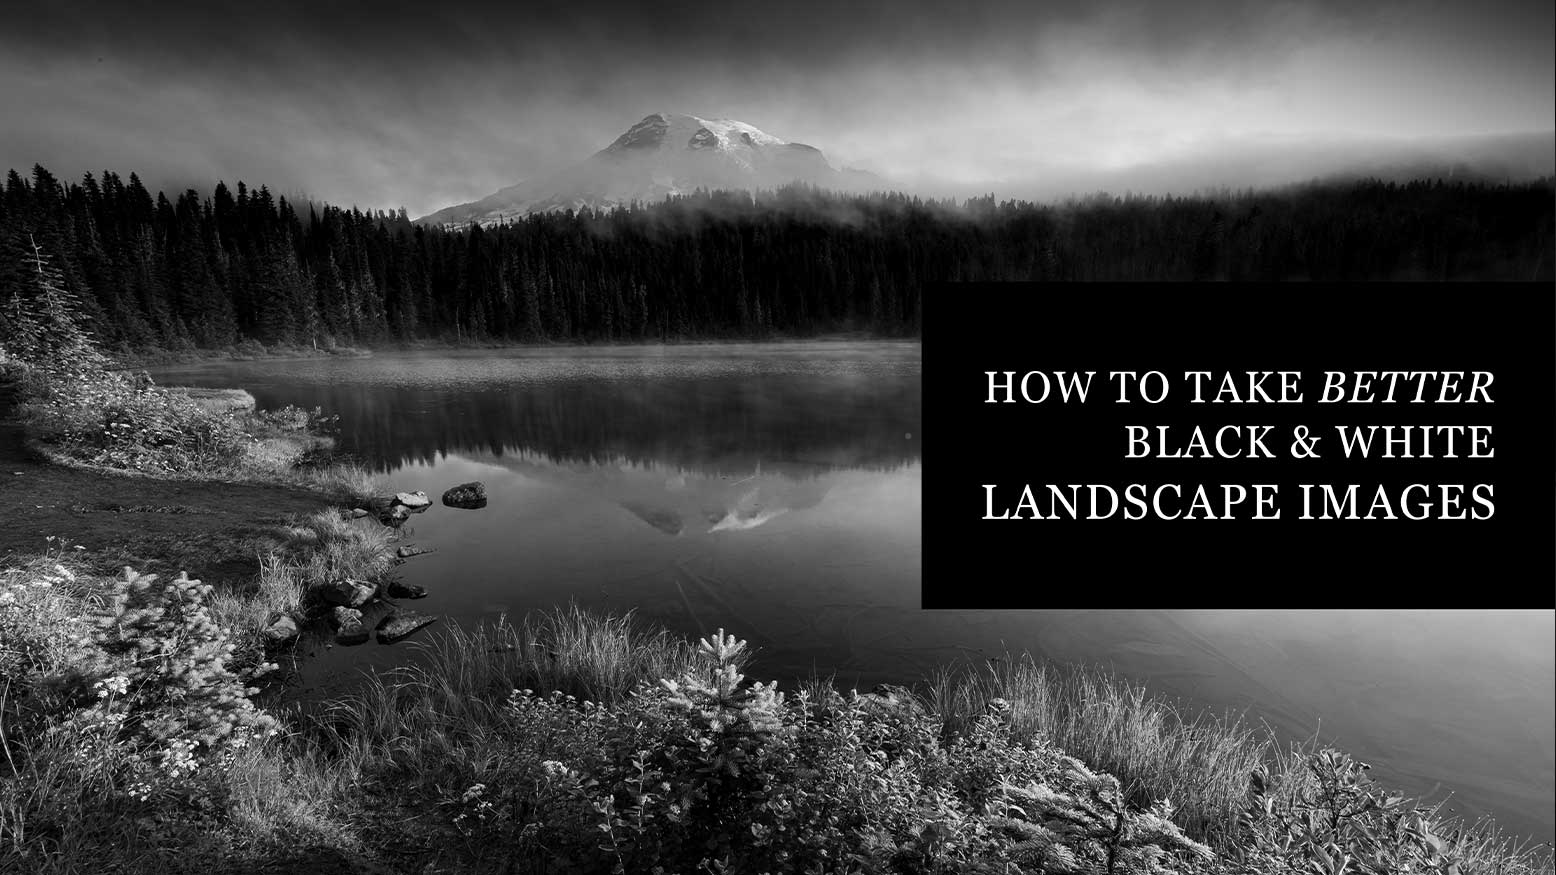 Black & White Landscape Images